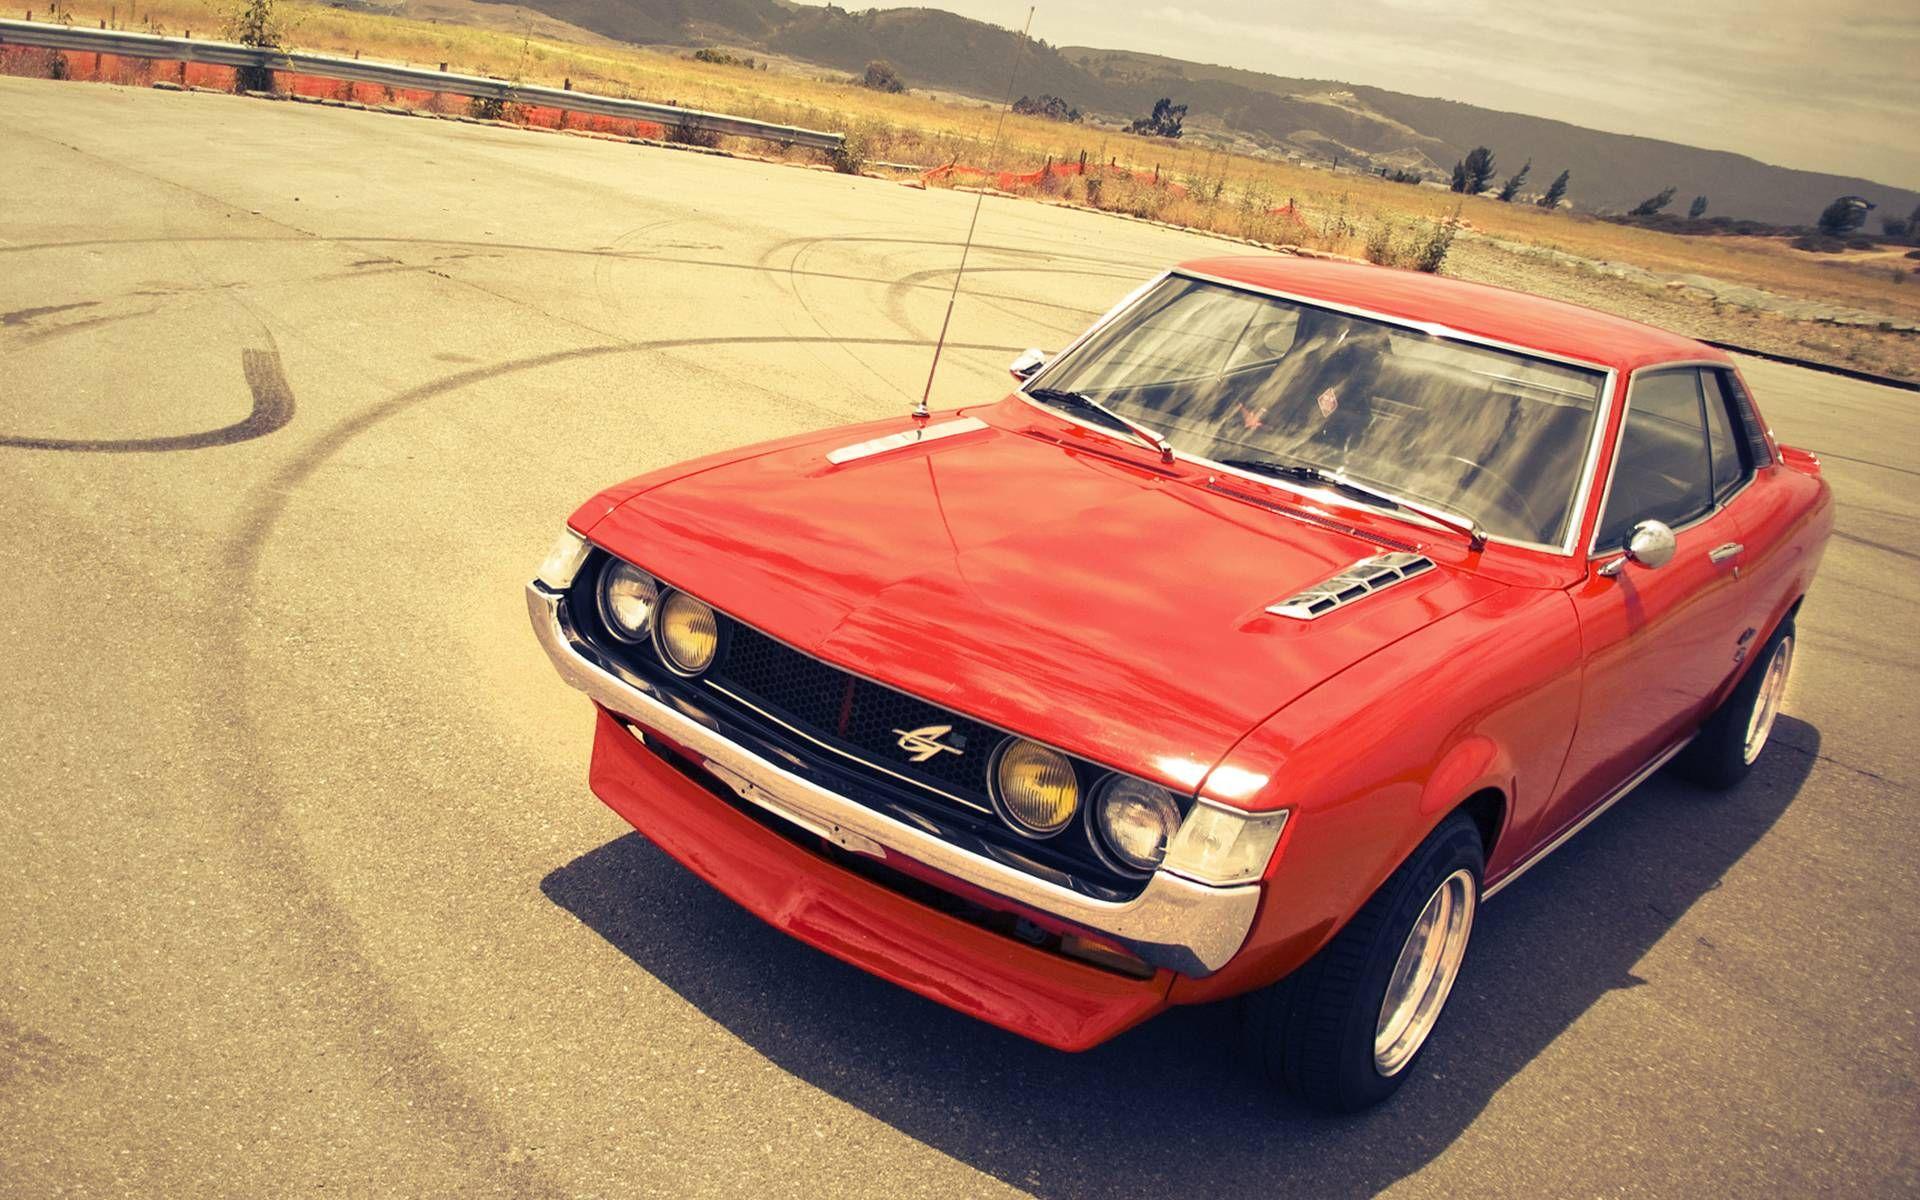 1970 TOYOTA TA22 Celica 1600GT | Toyota celica, Toyota ...